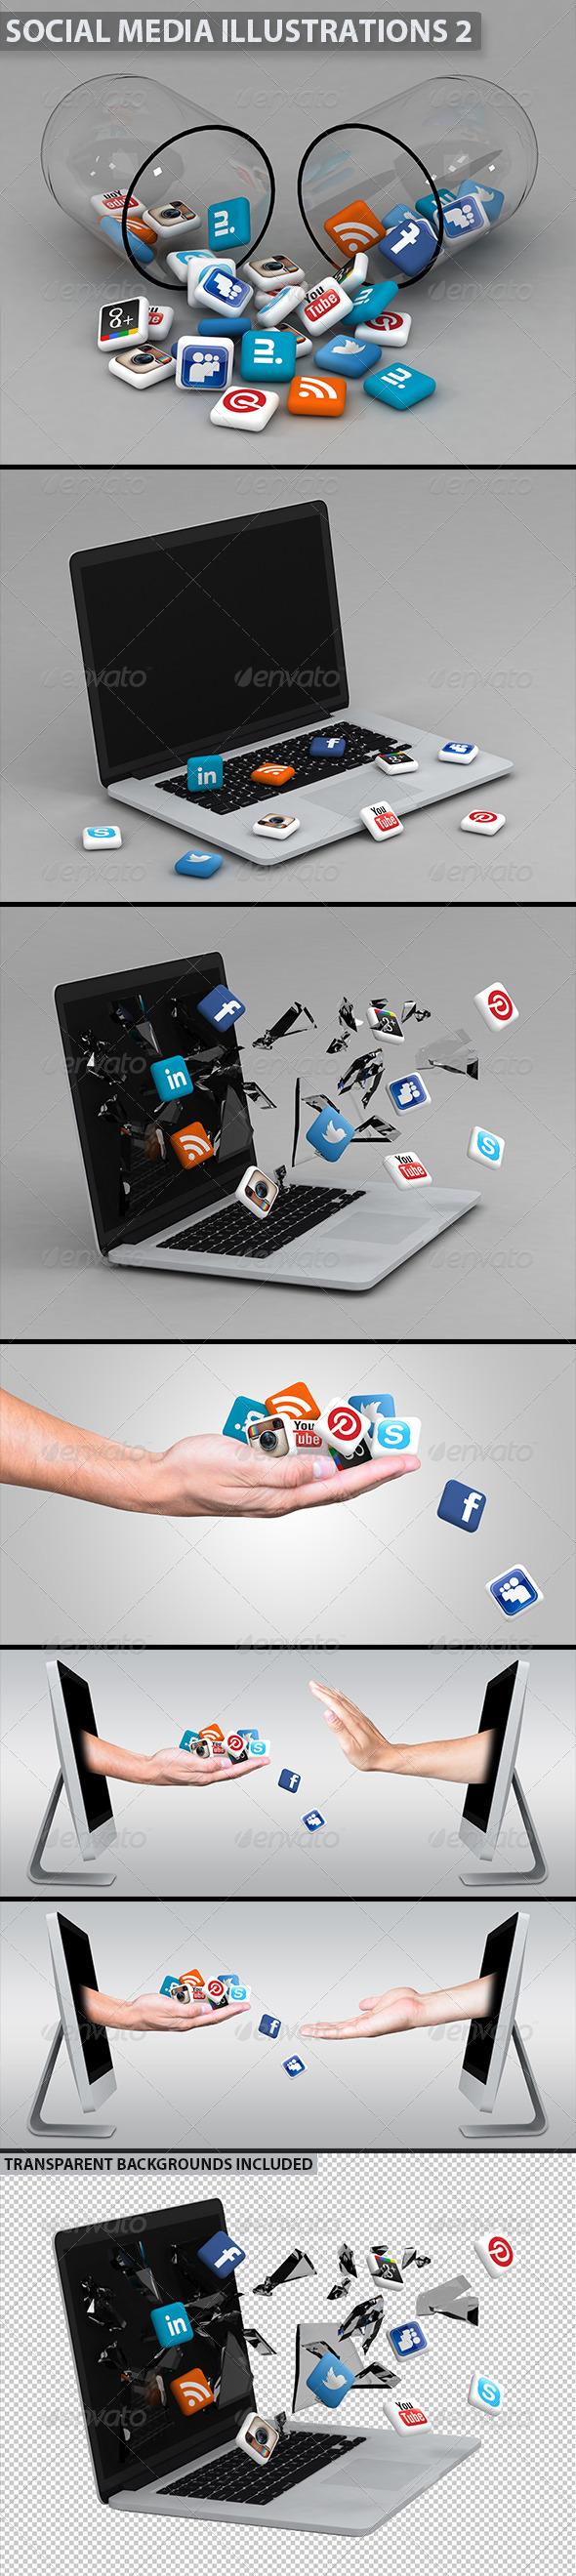 GraphicRiver Social Media Illustrations 2 5390461